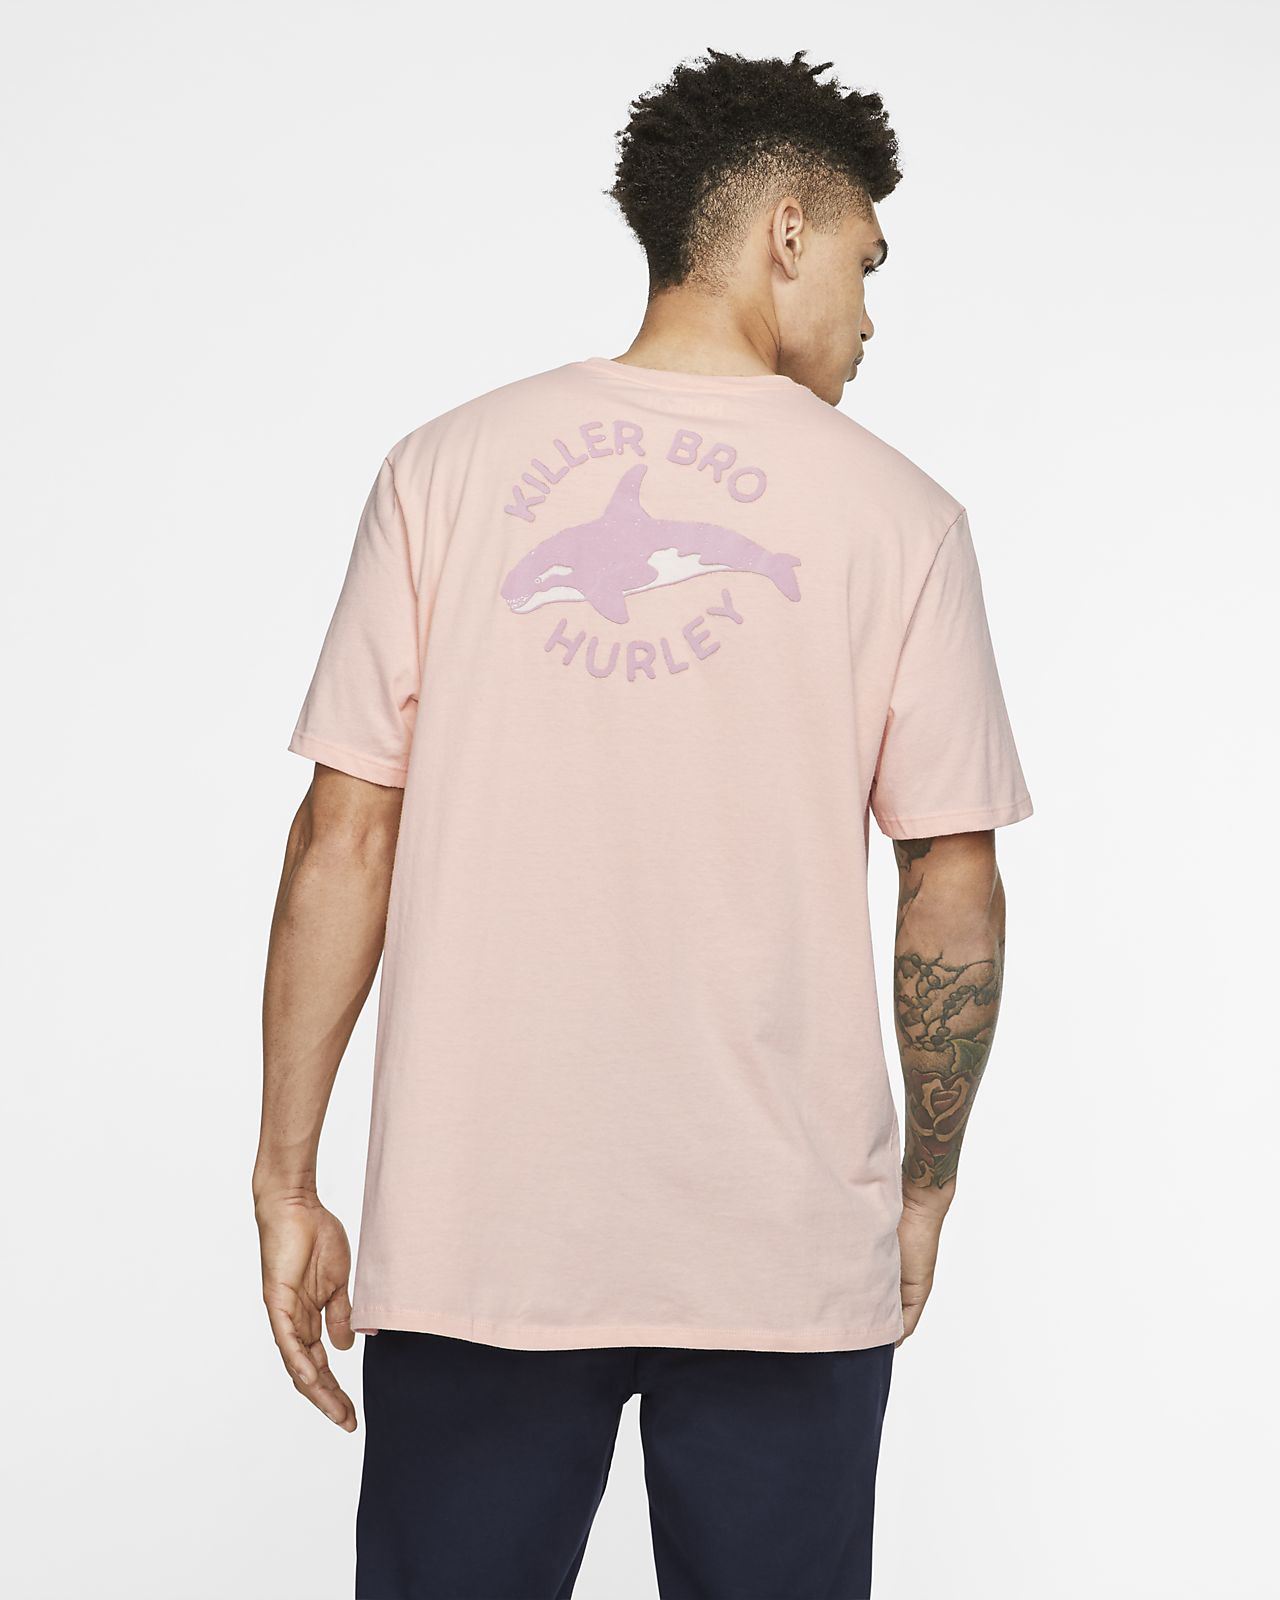 Pánské tričko Hurley Premium Killer Bro Pocket s exkluzivním střihem